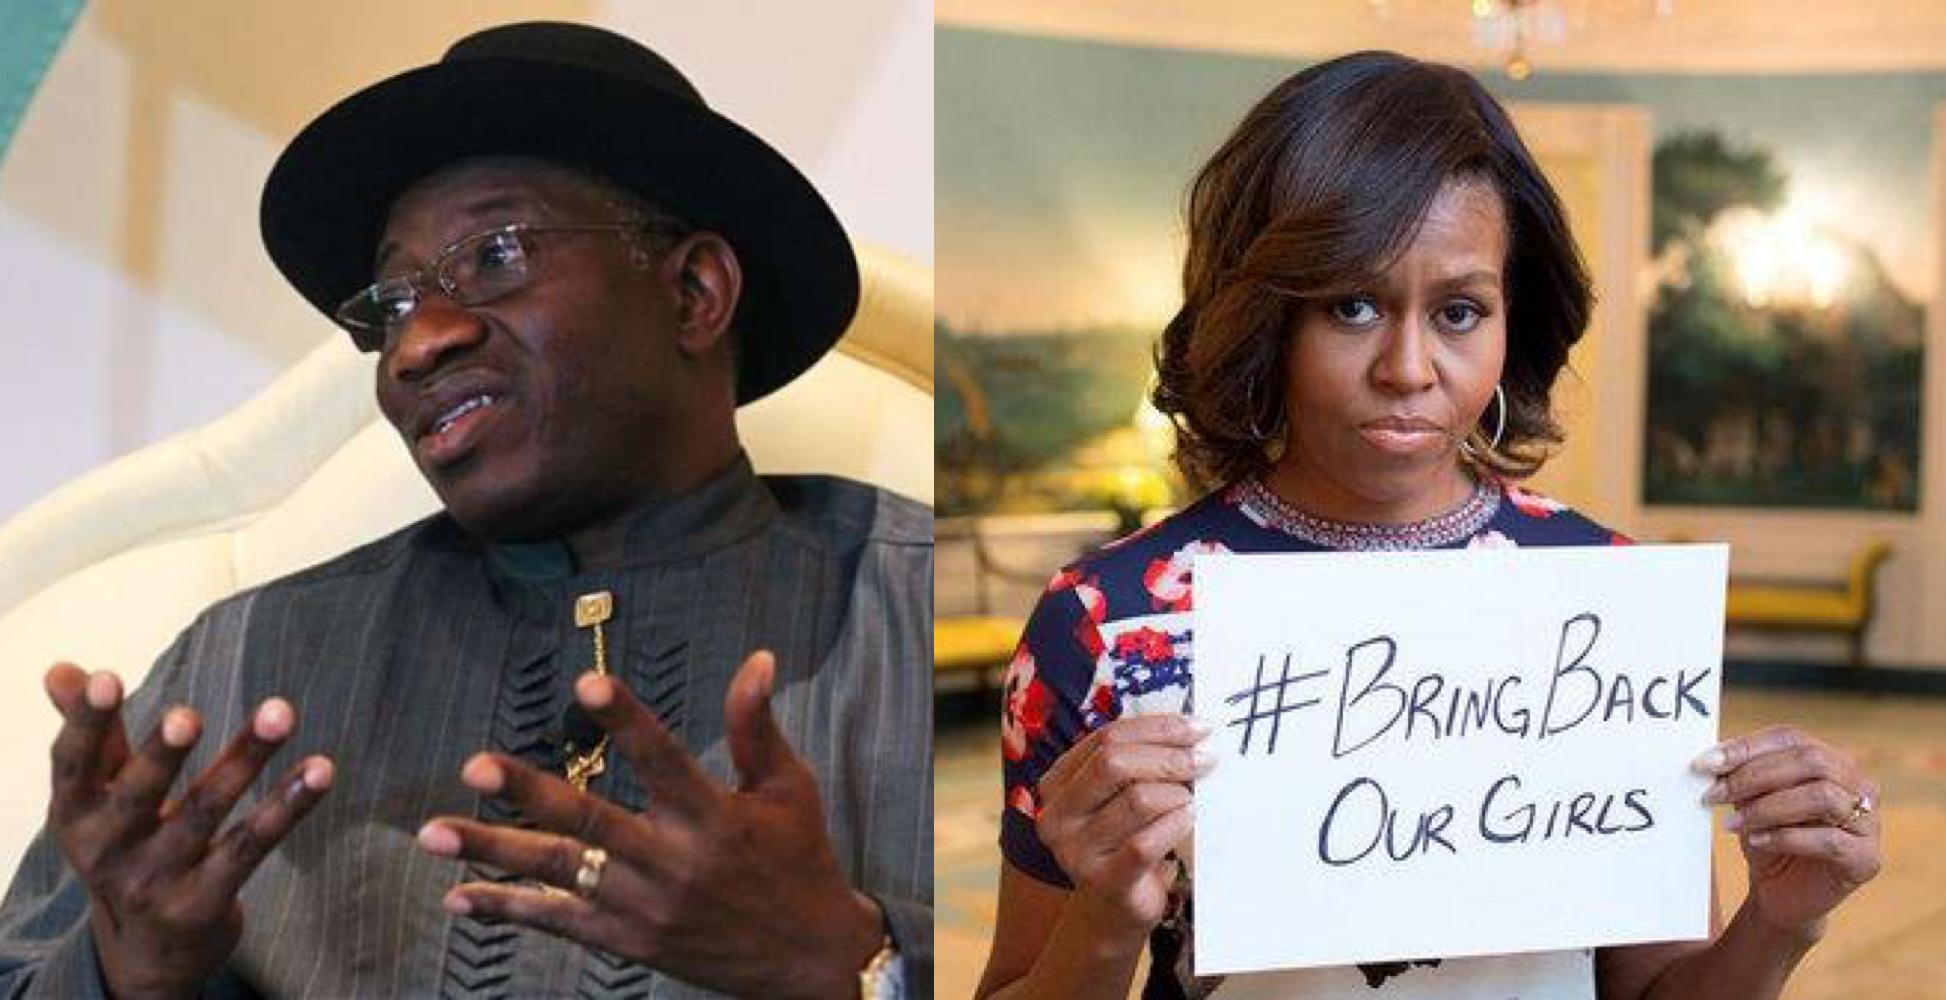 Michelle Obama's social media activism cost Nigeria's ex-President